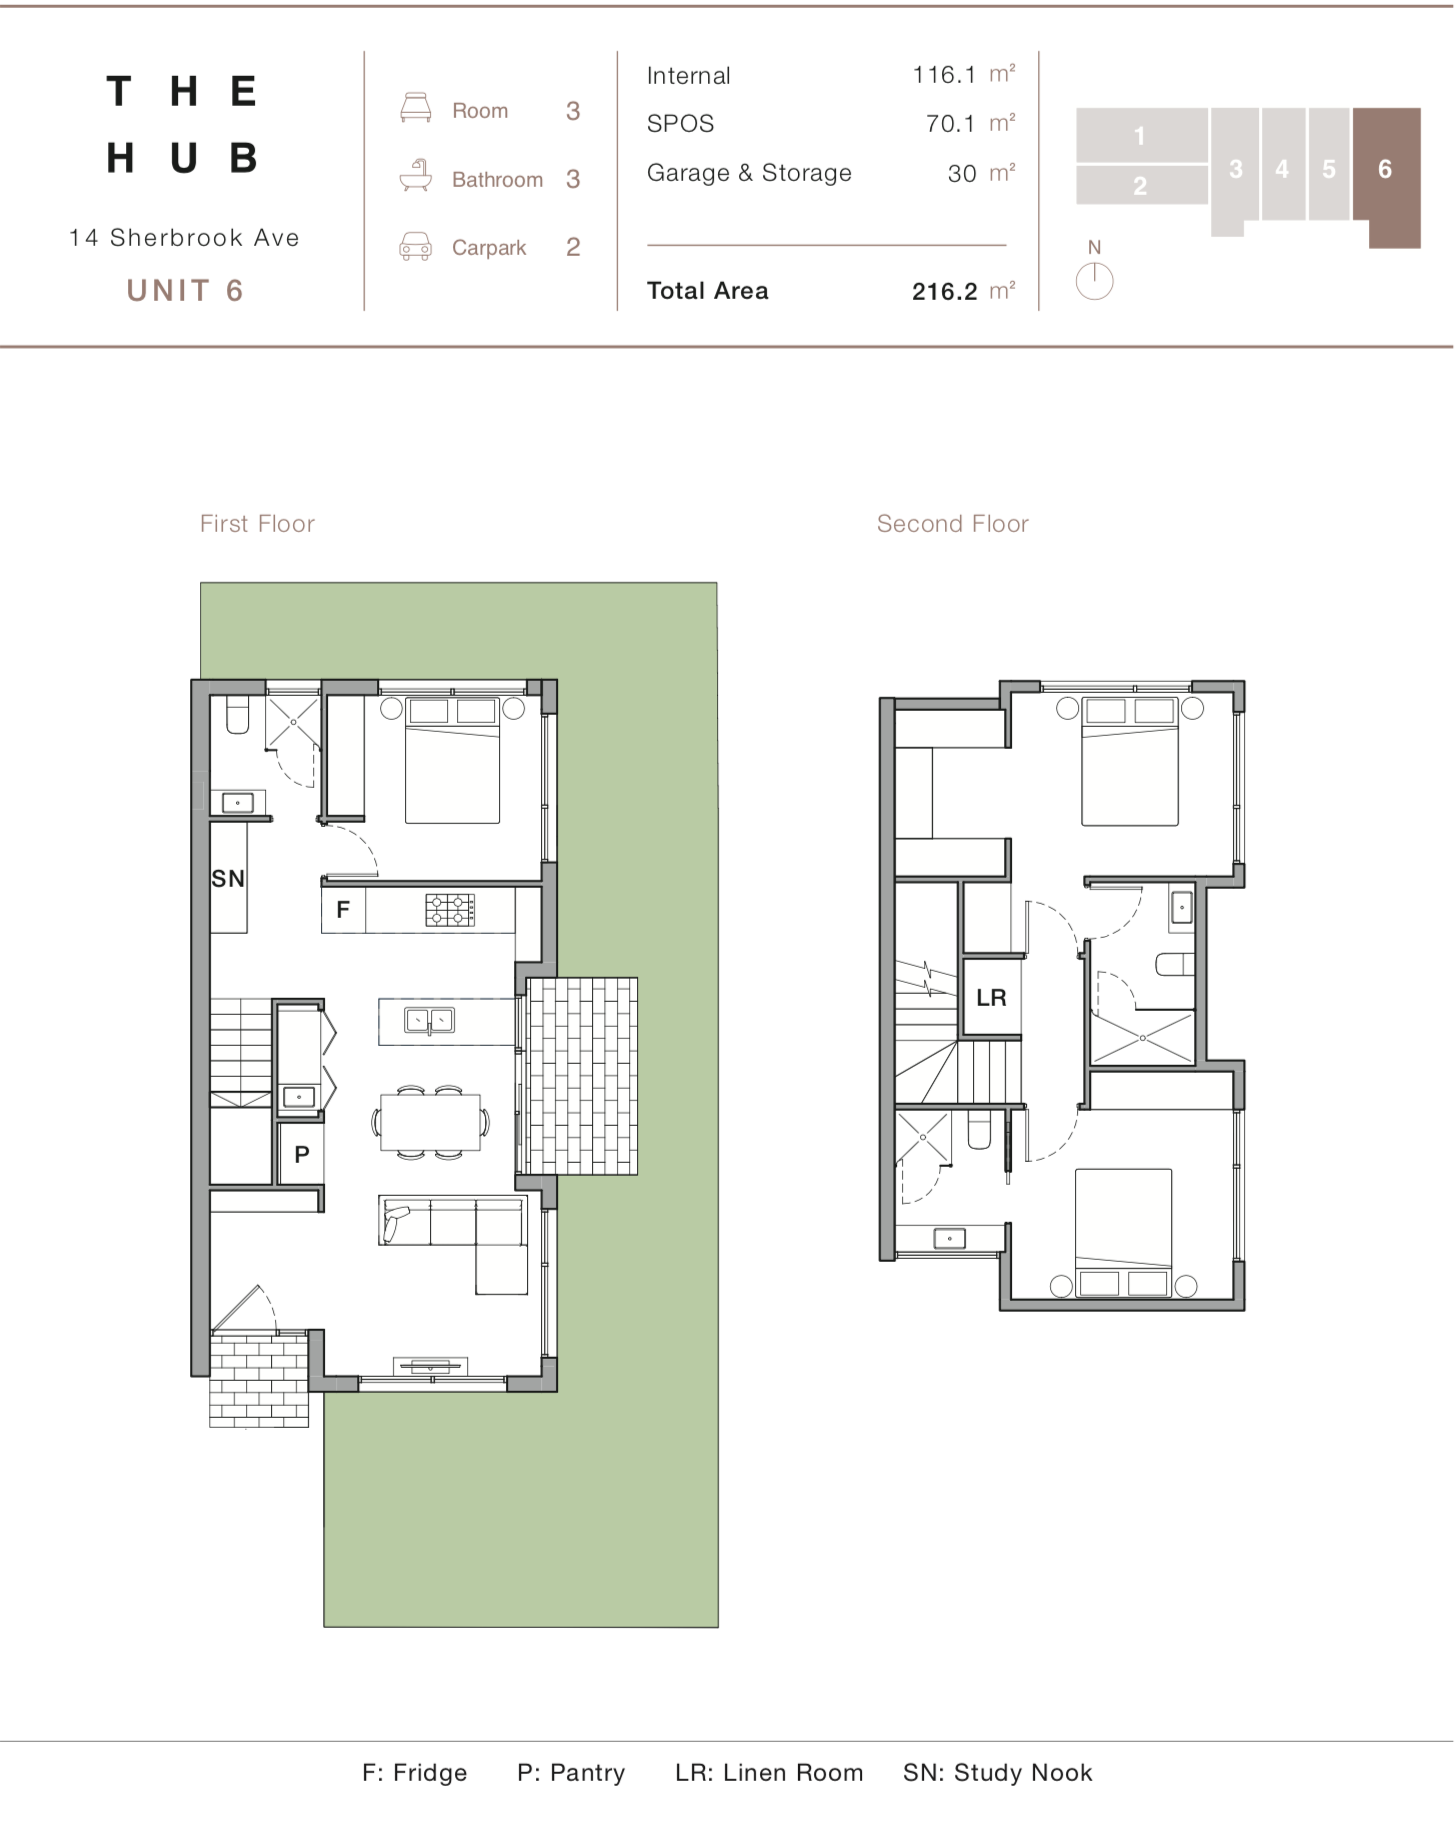 Floor Plan - Unit 6